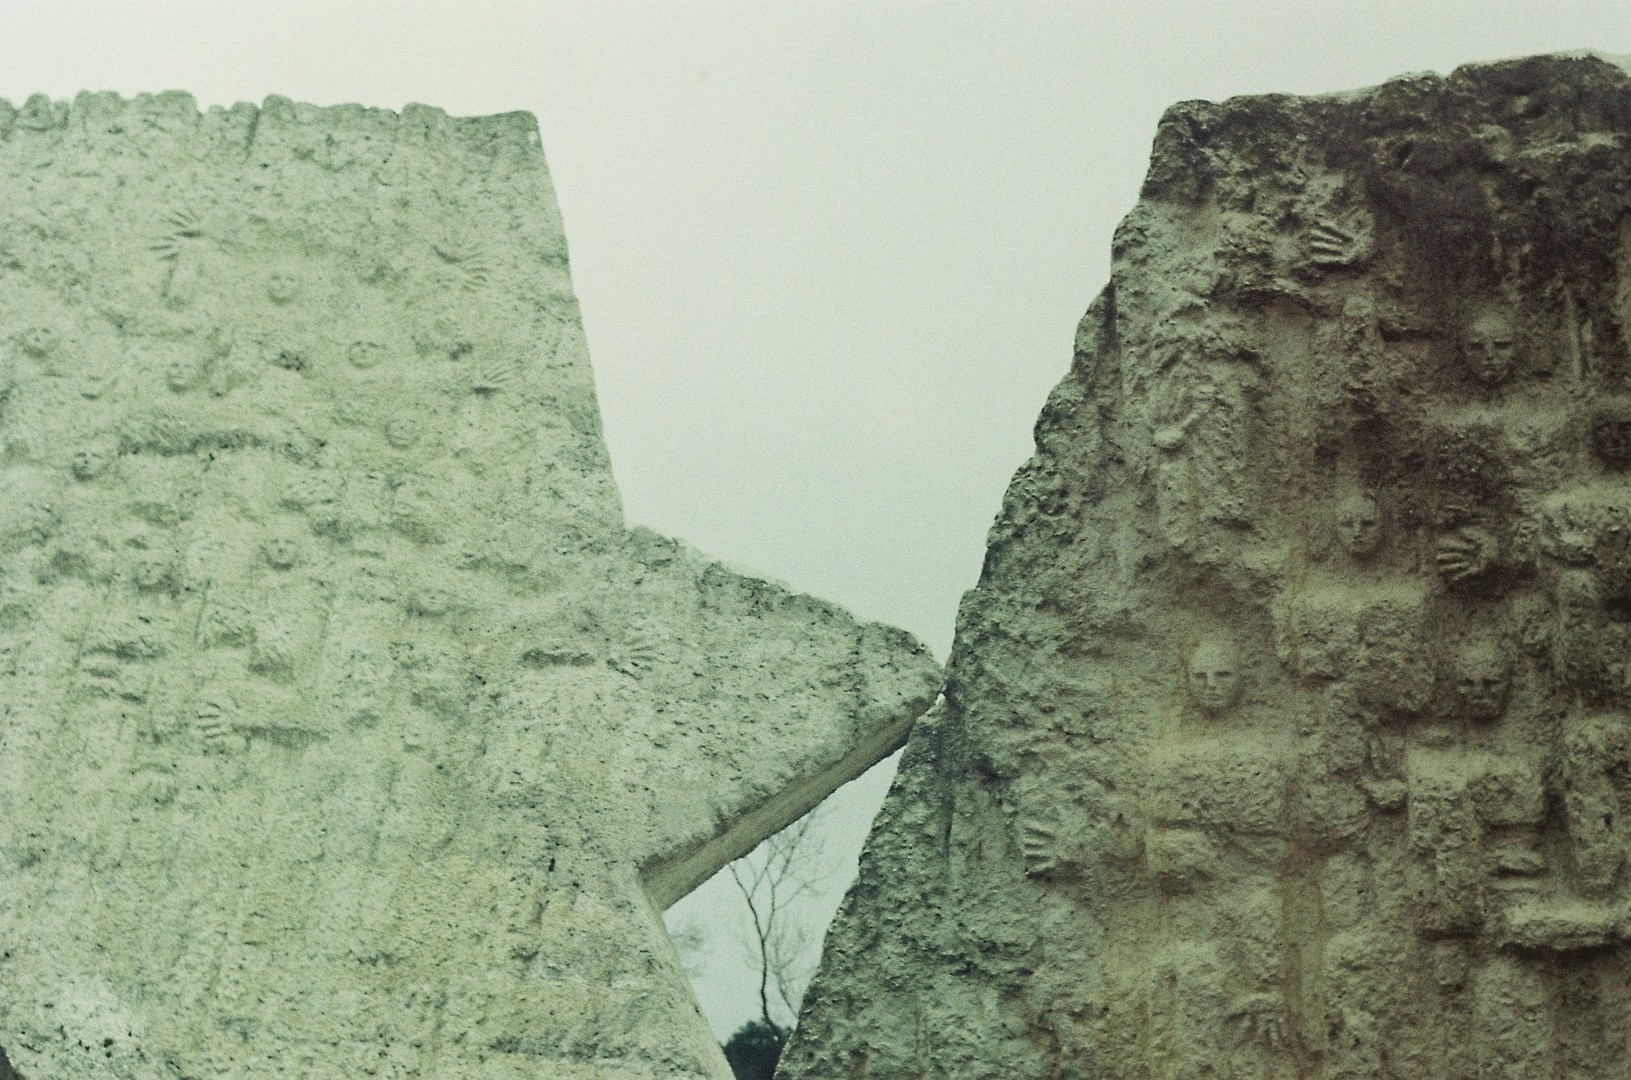 Spomenik streljanim đacima, detalji 2